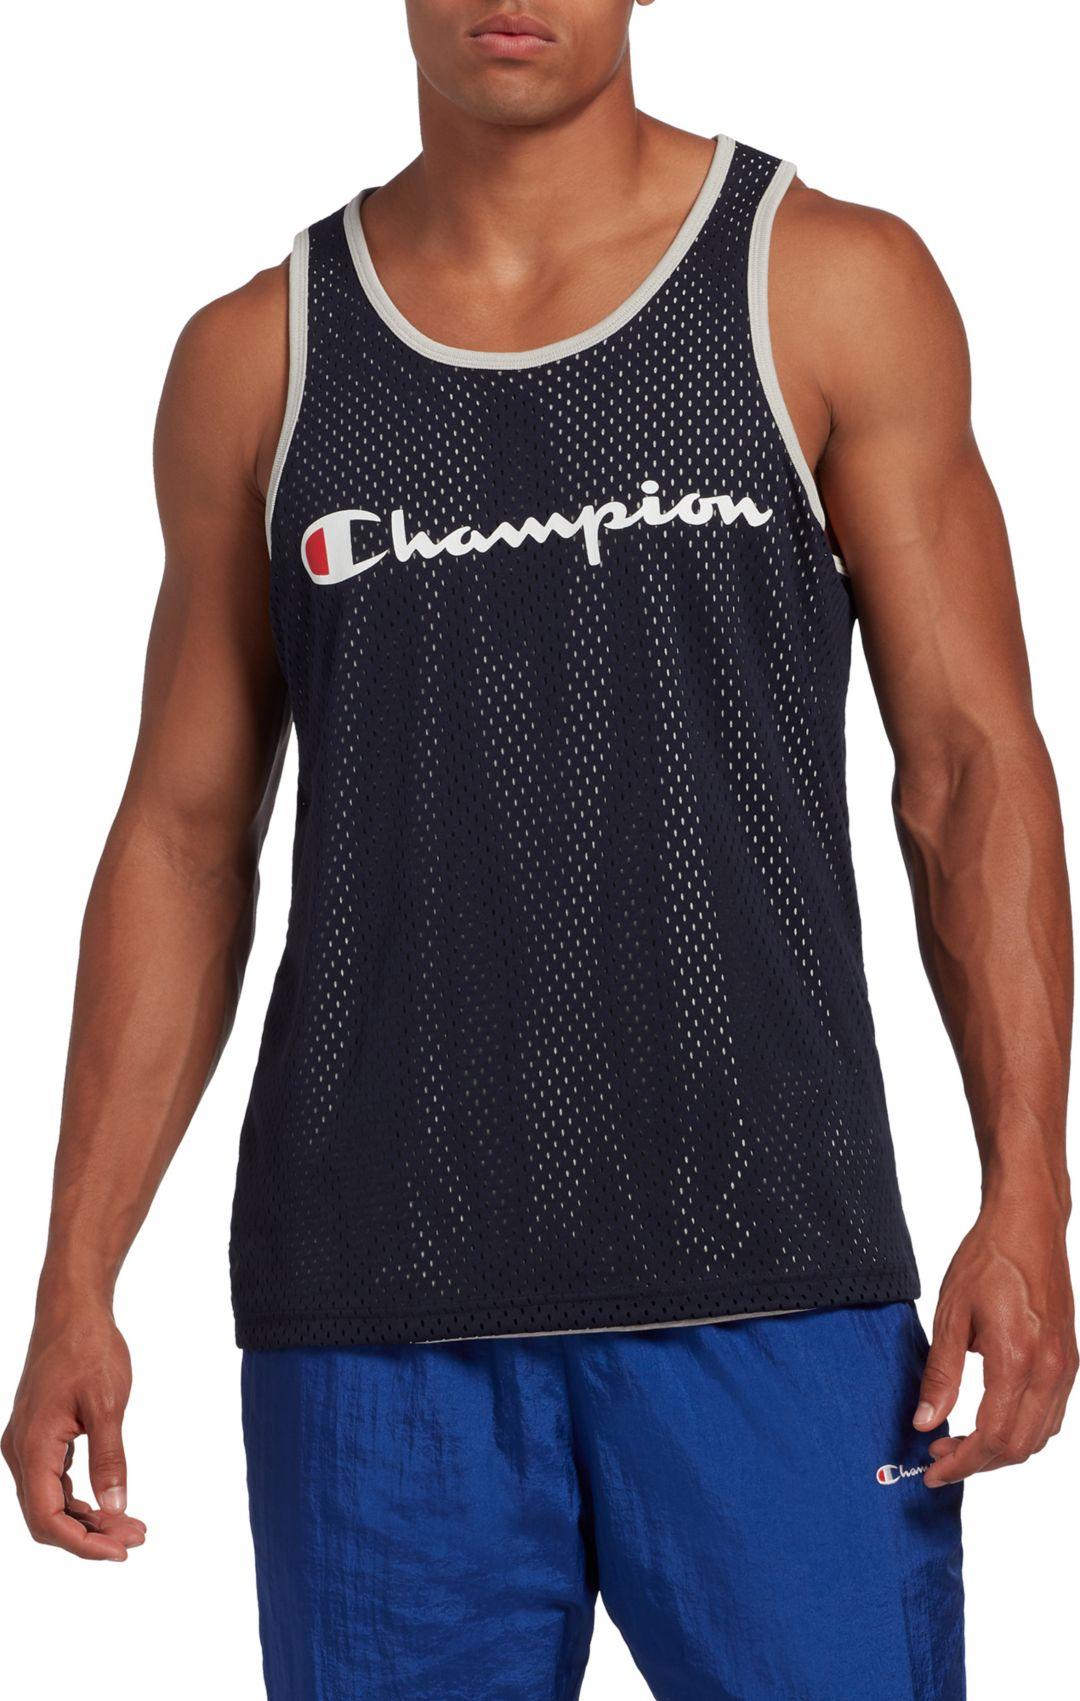 fea6d88c603d Champion Men's Reversible Mesh Tank Top   DICK'S Sporting Goods